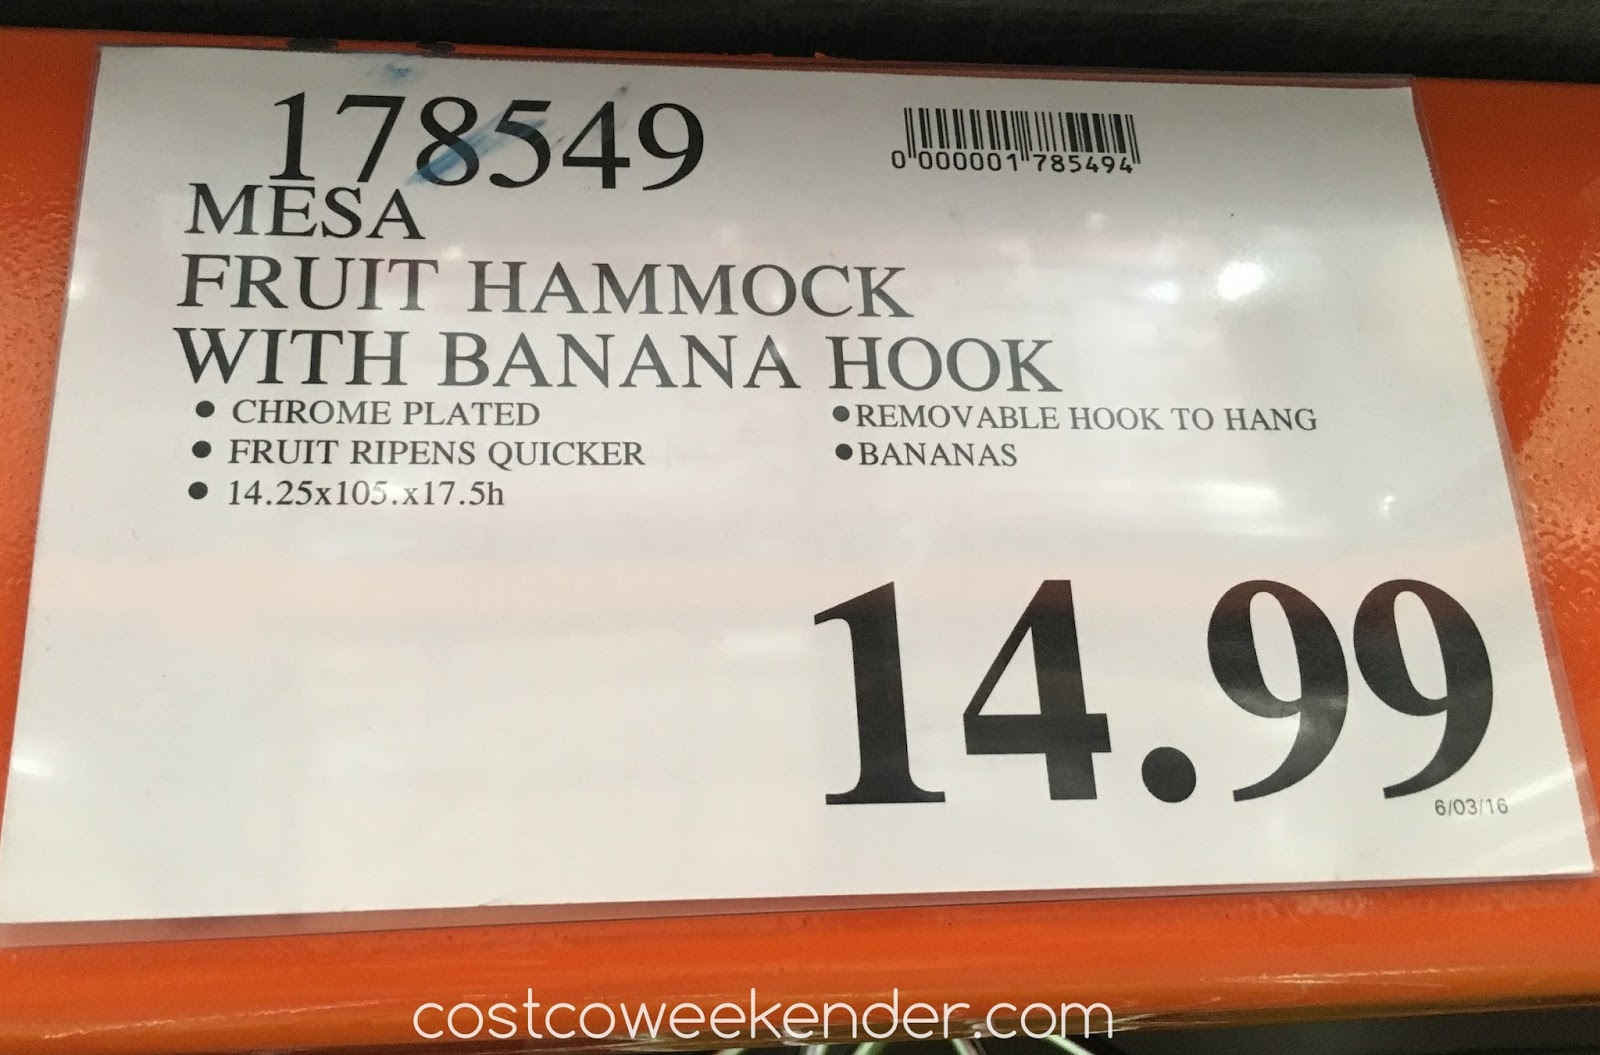 Mesa Fruit Hammock With Banana Hook | Costco Weekender